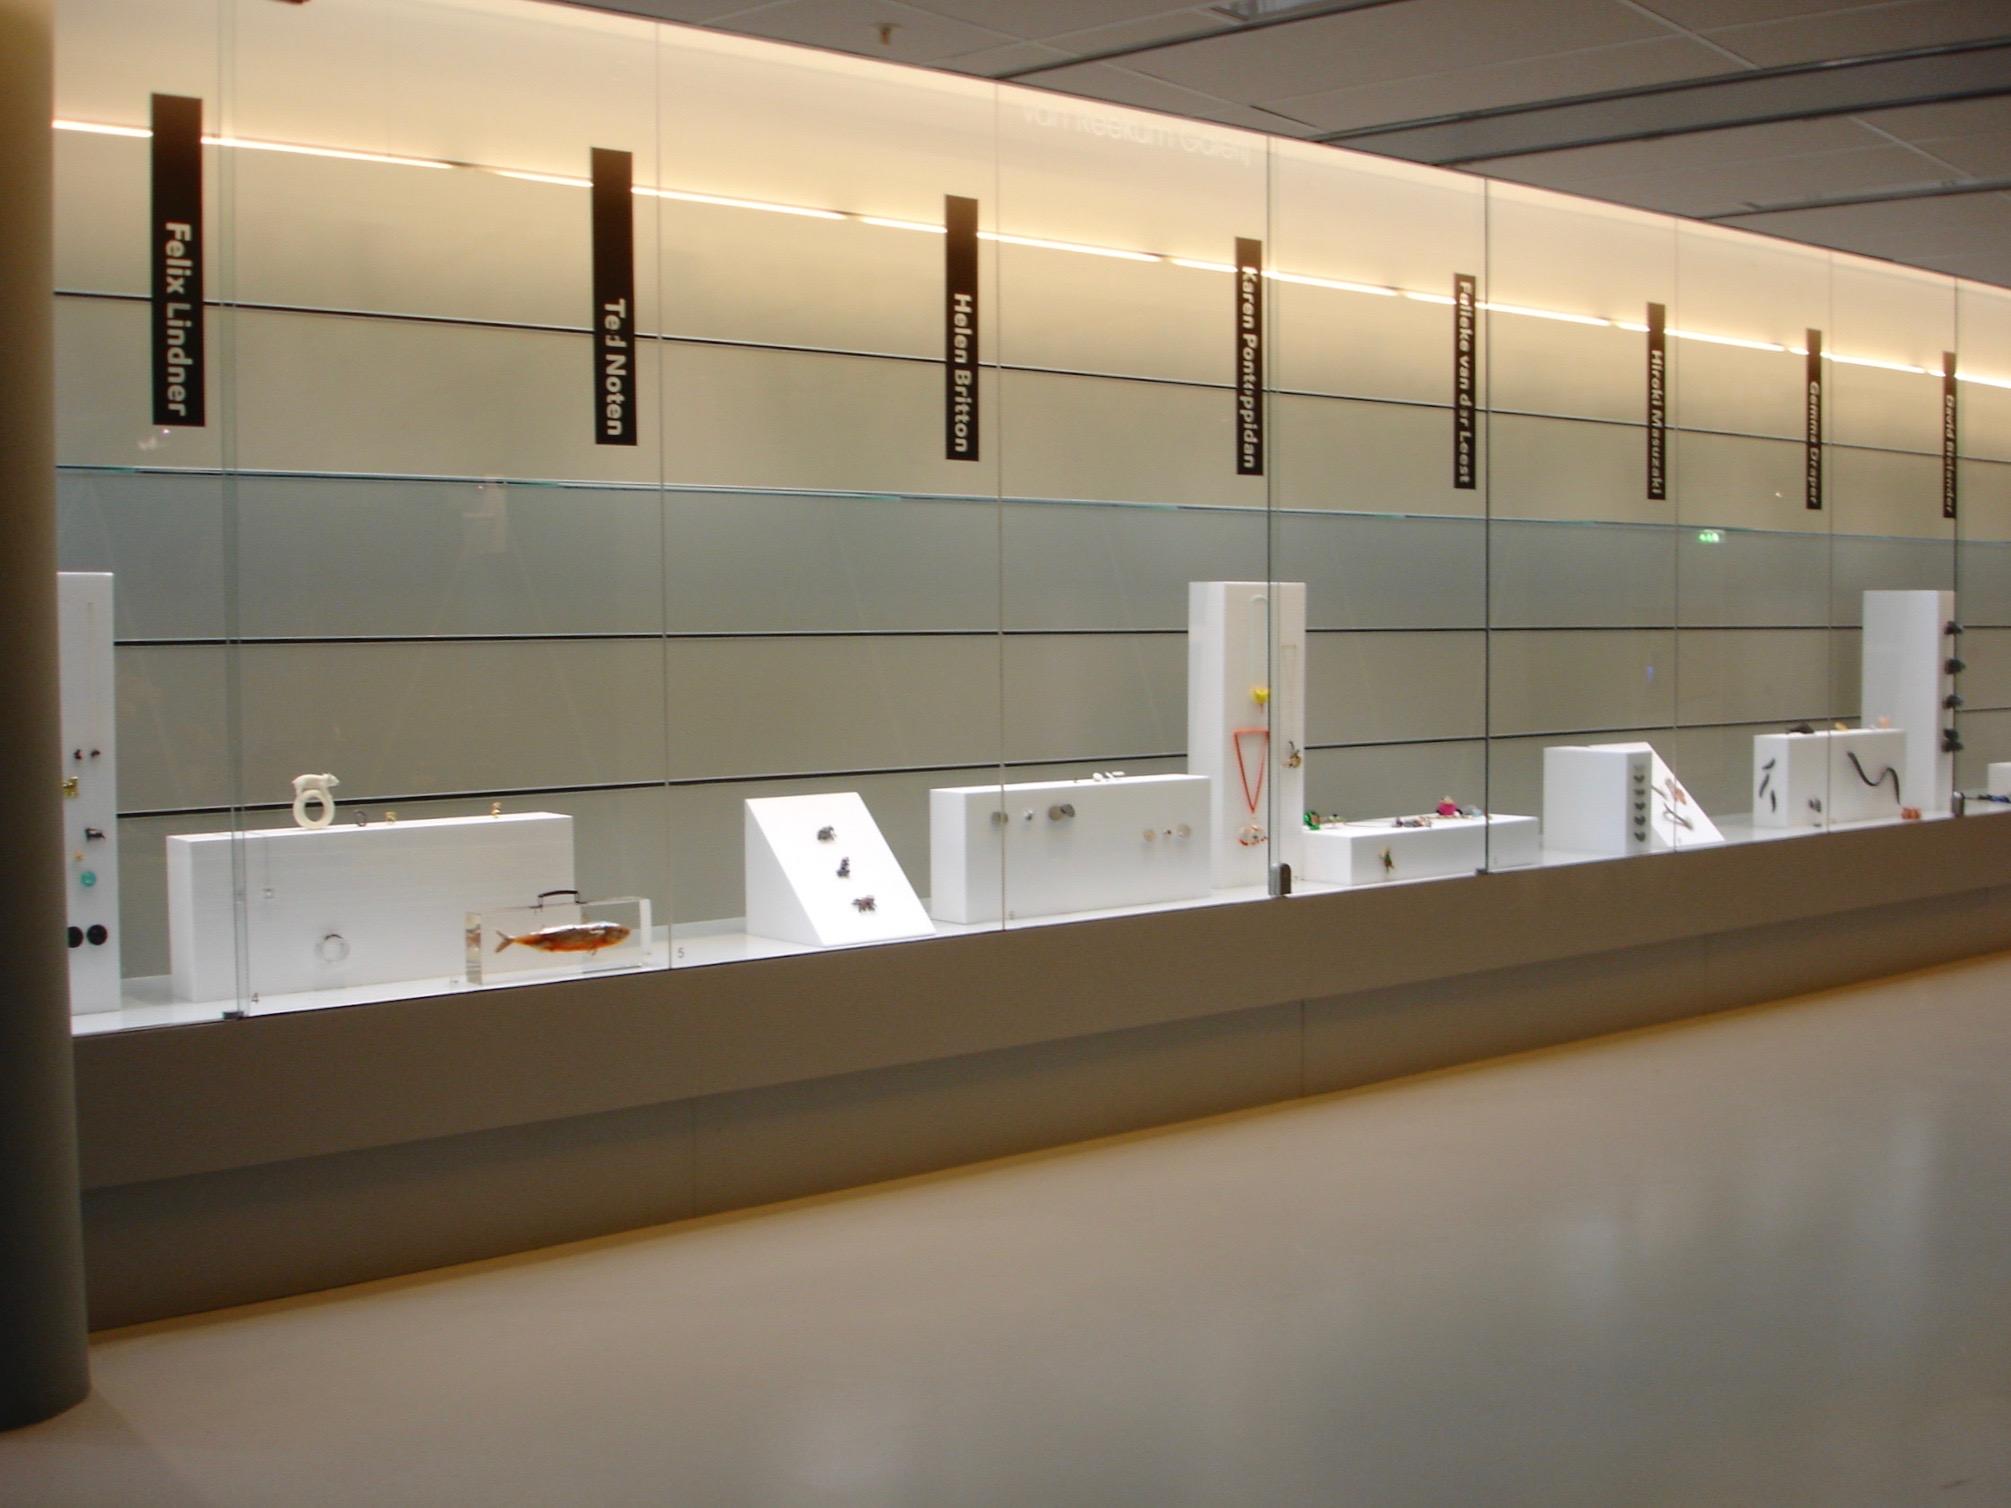 Sieren met dieren, CODA, 2009, tentoonstelling, wandvitrine